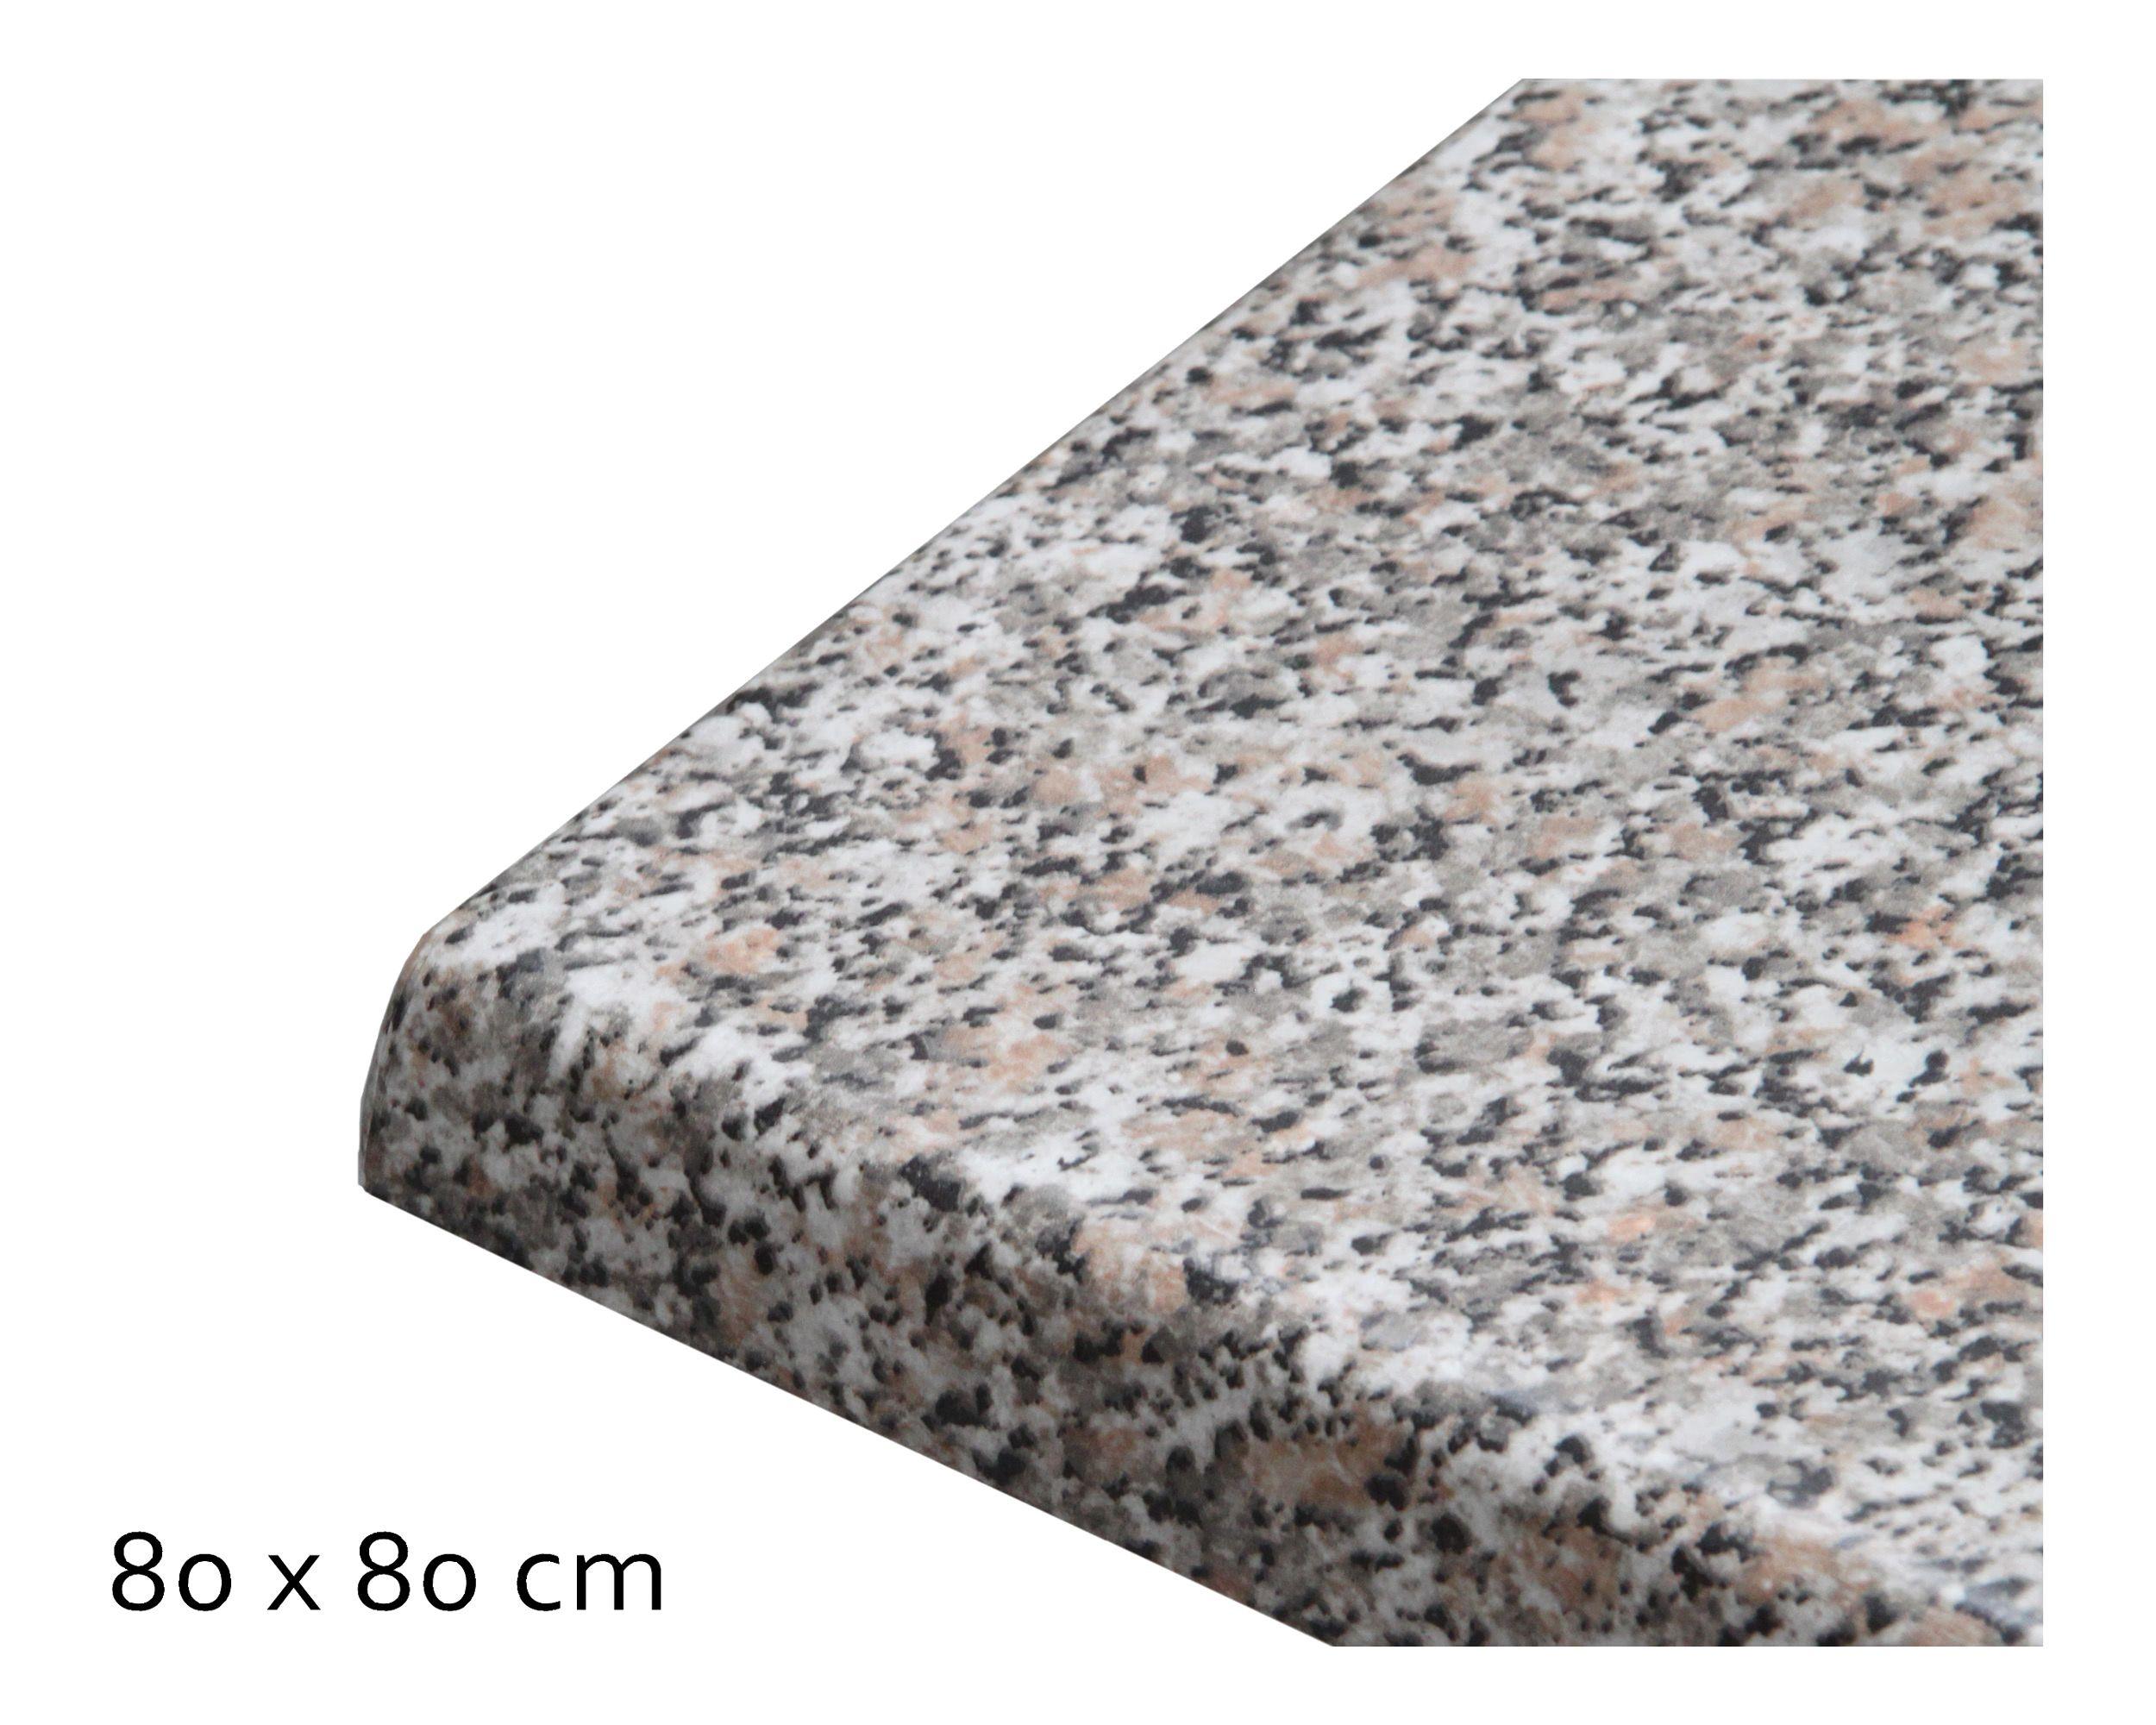 Tischplatte Topalit Standard, 80x80 cm